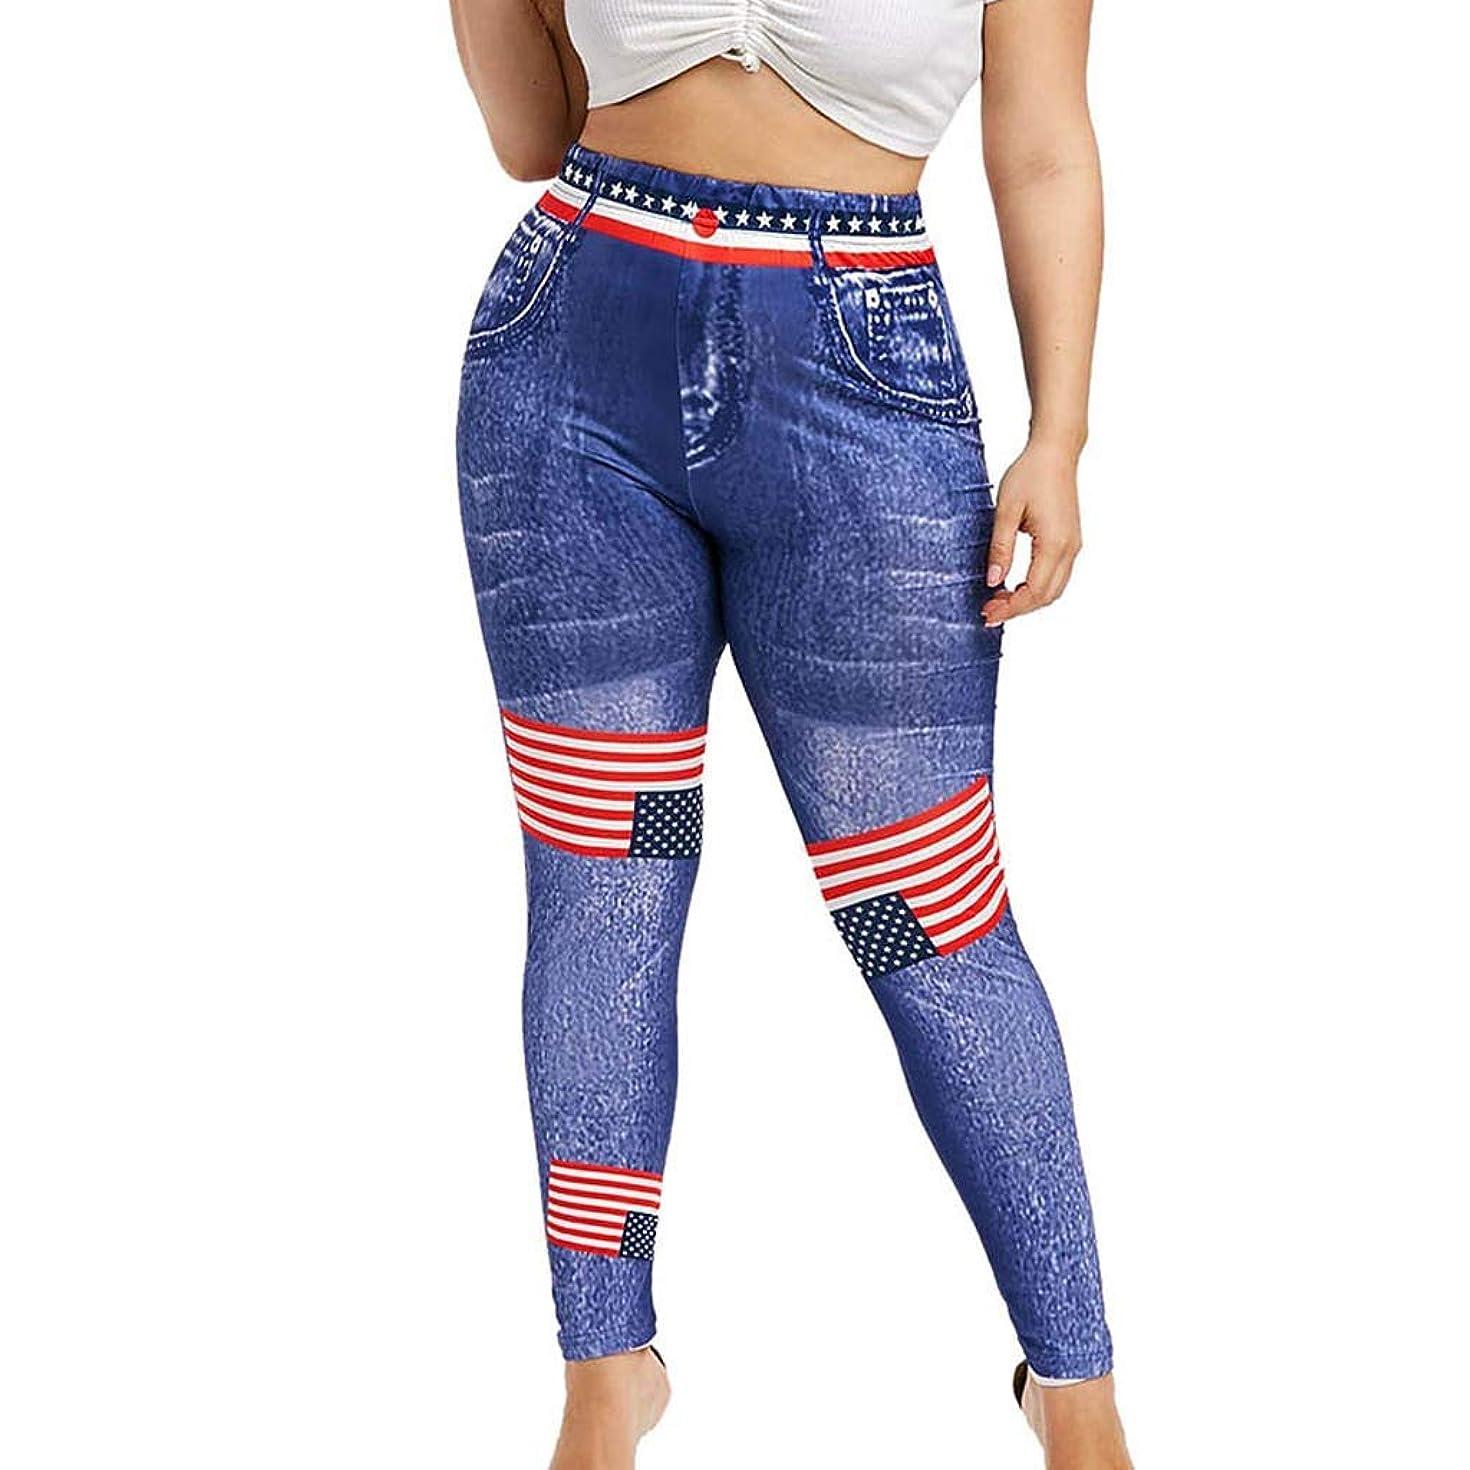 Plus Size Yoga Pants for Women,High Waist American Flag 3D Jean Print Leggings